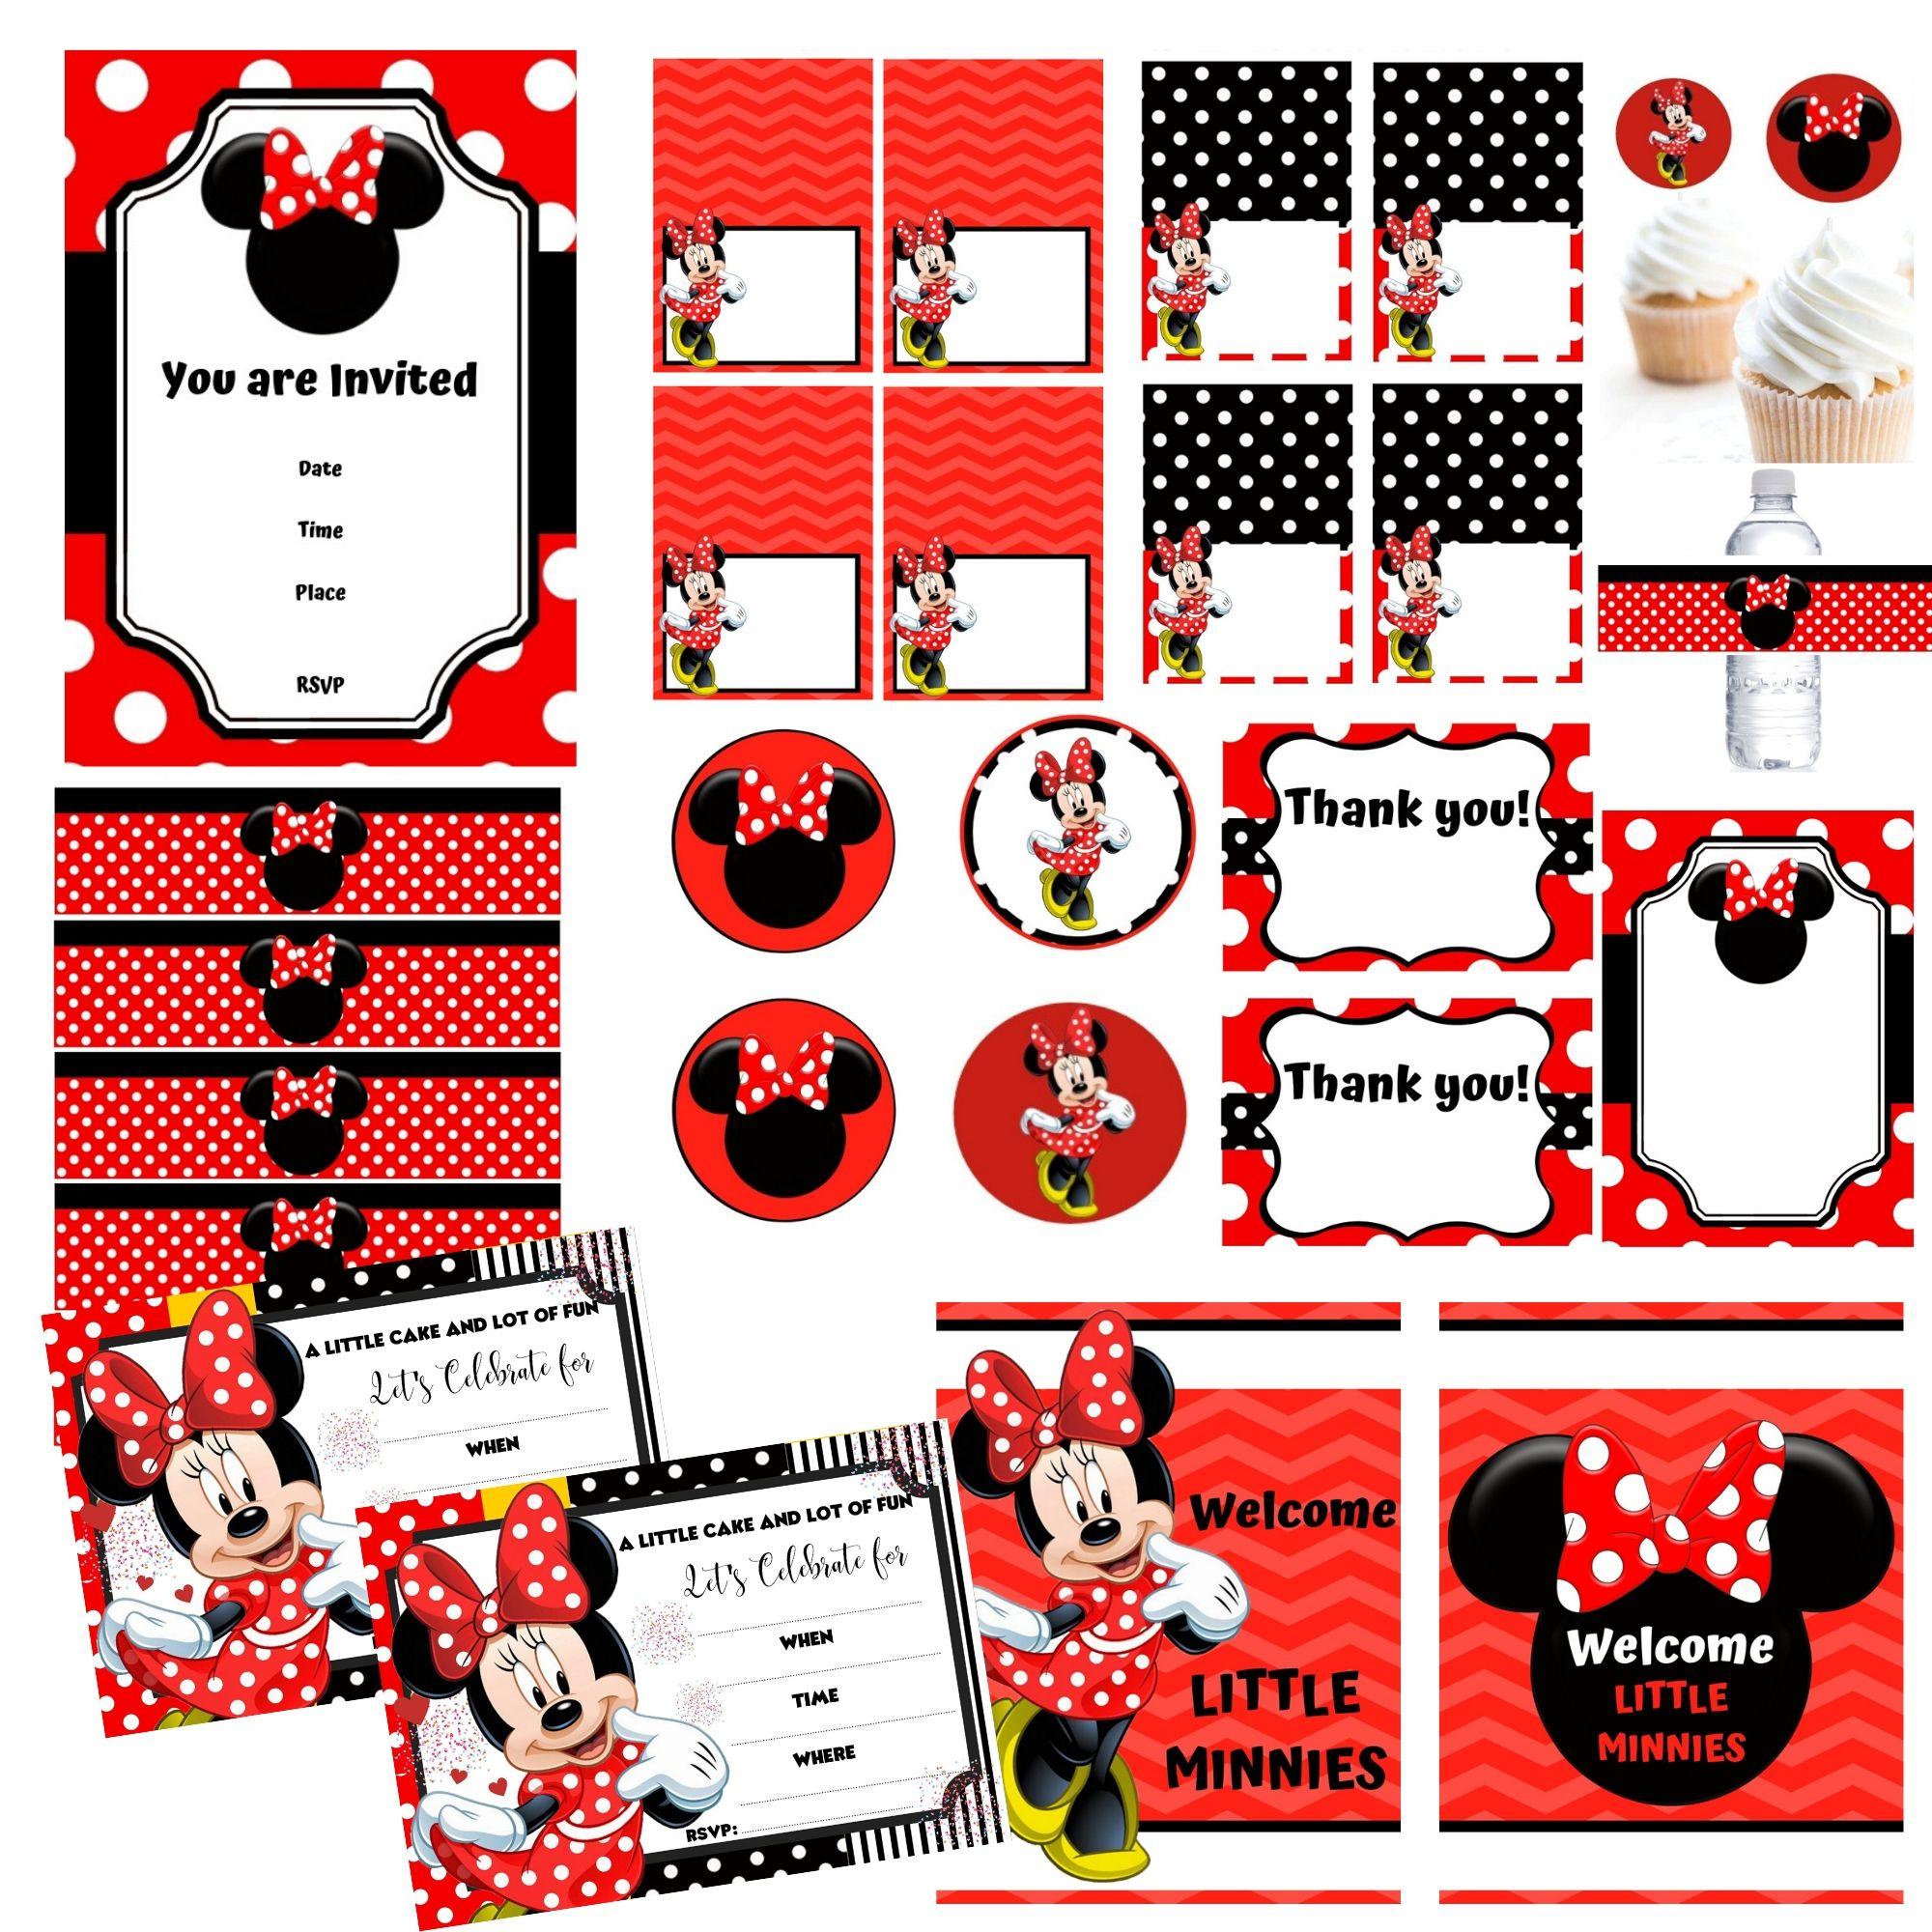 FREE PRINTABLE Minnie Mouse Birthday Party